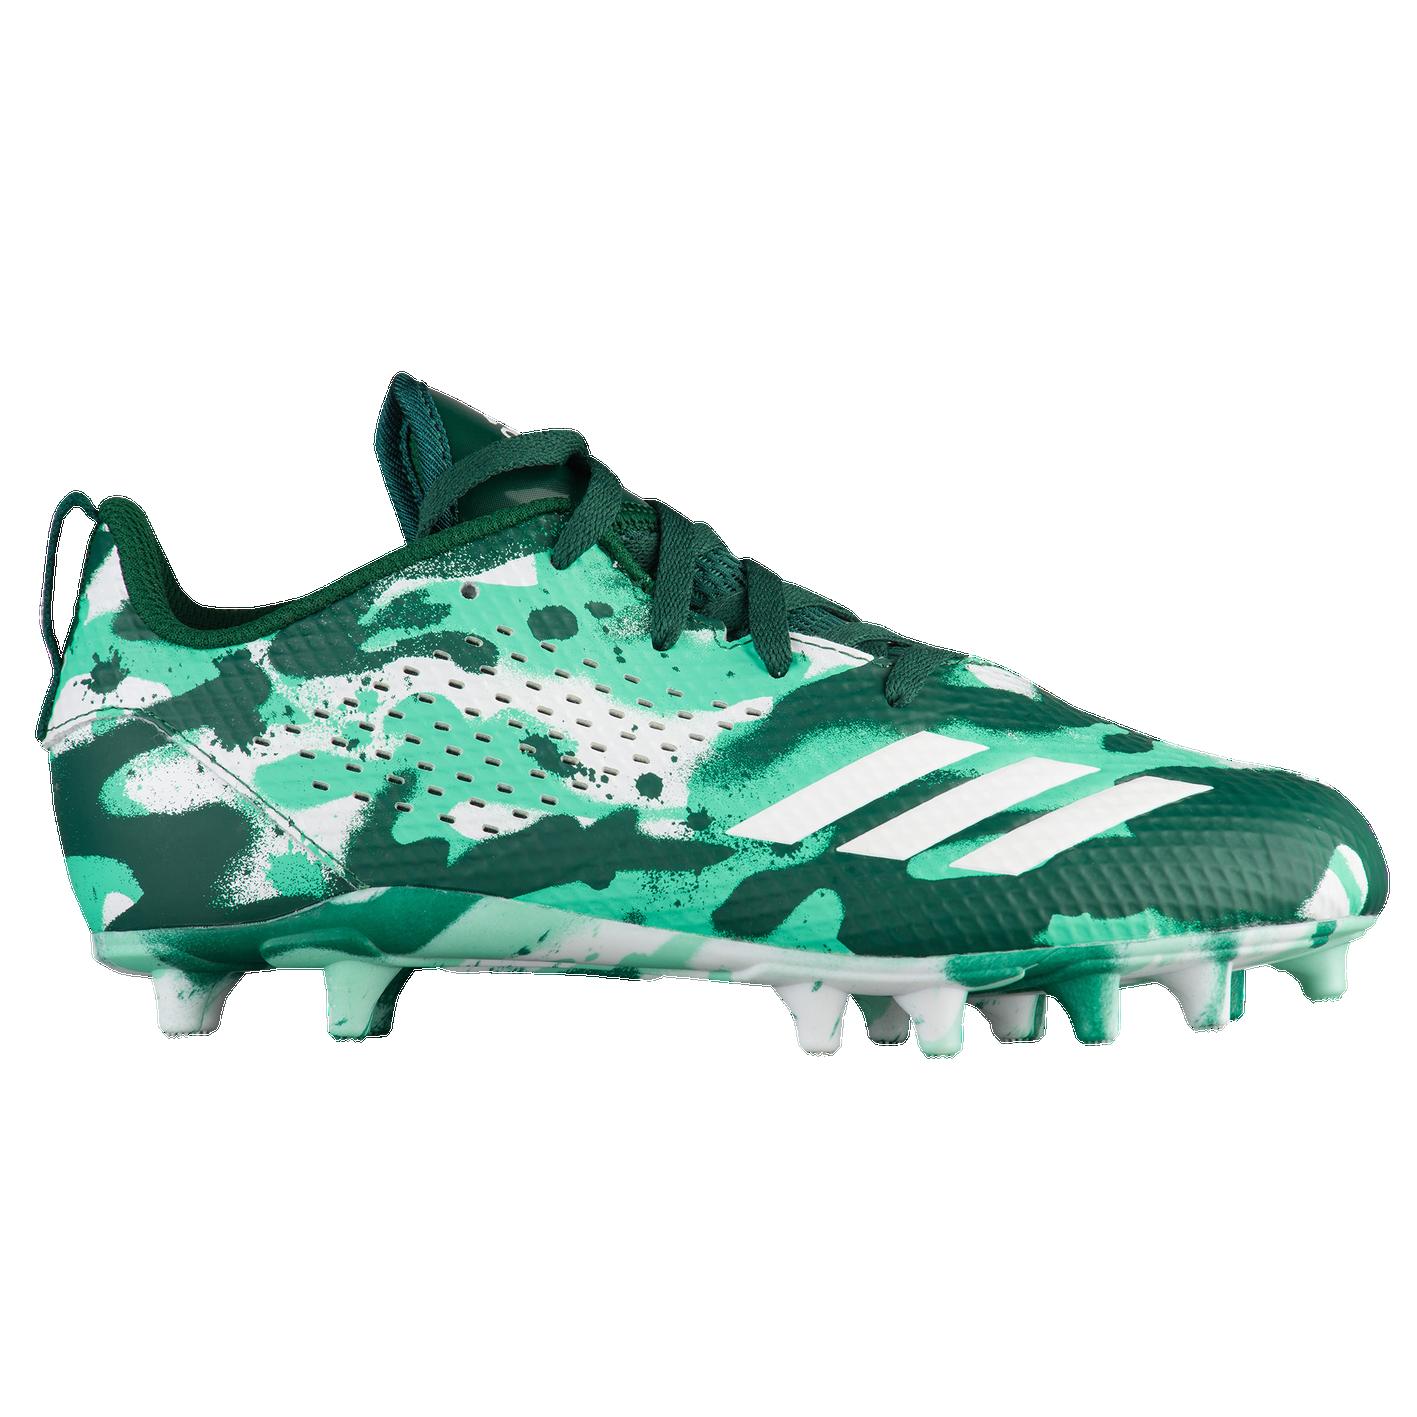 753ef94d6d0 adidas adiZero 5-Star 7.0 J - Boys  Grade School - Football - Shoes ...